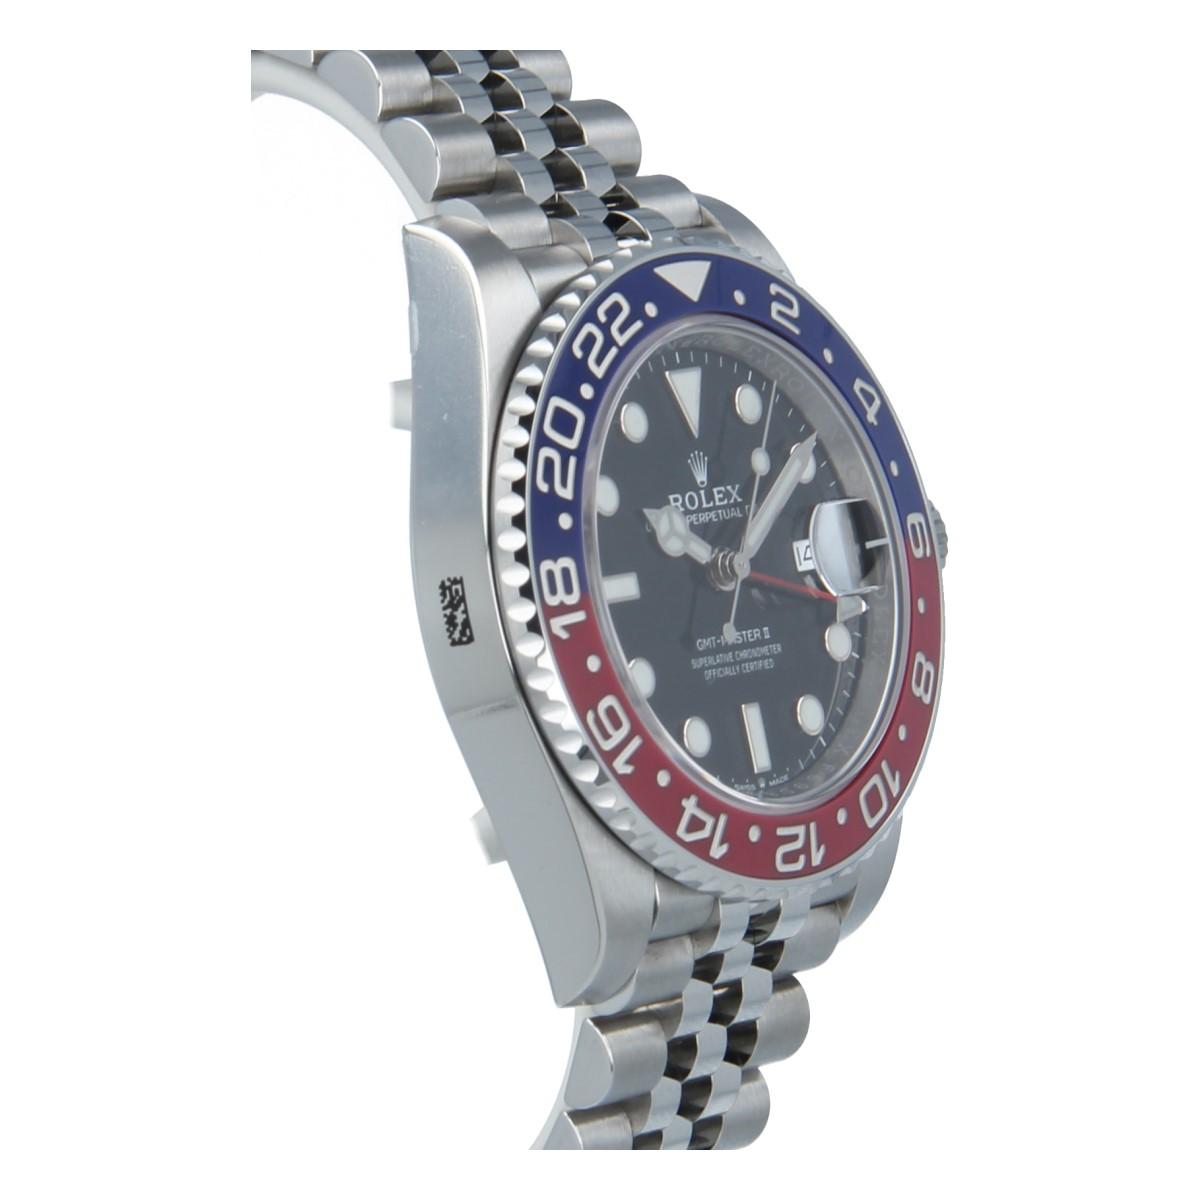 Second Hand Rolex Watches >> Rolex GMT-Master II 126710 BLRO PEPSI NEW | Buy second-hand Rolex watch